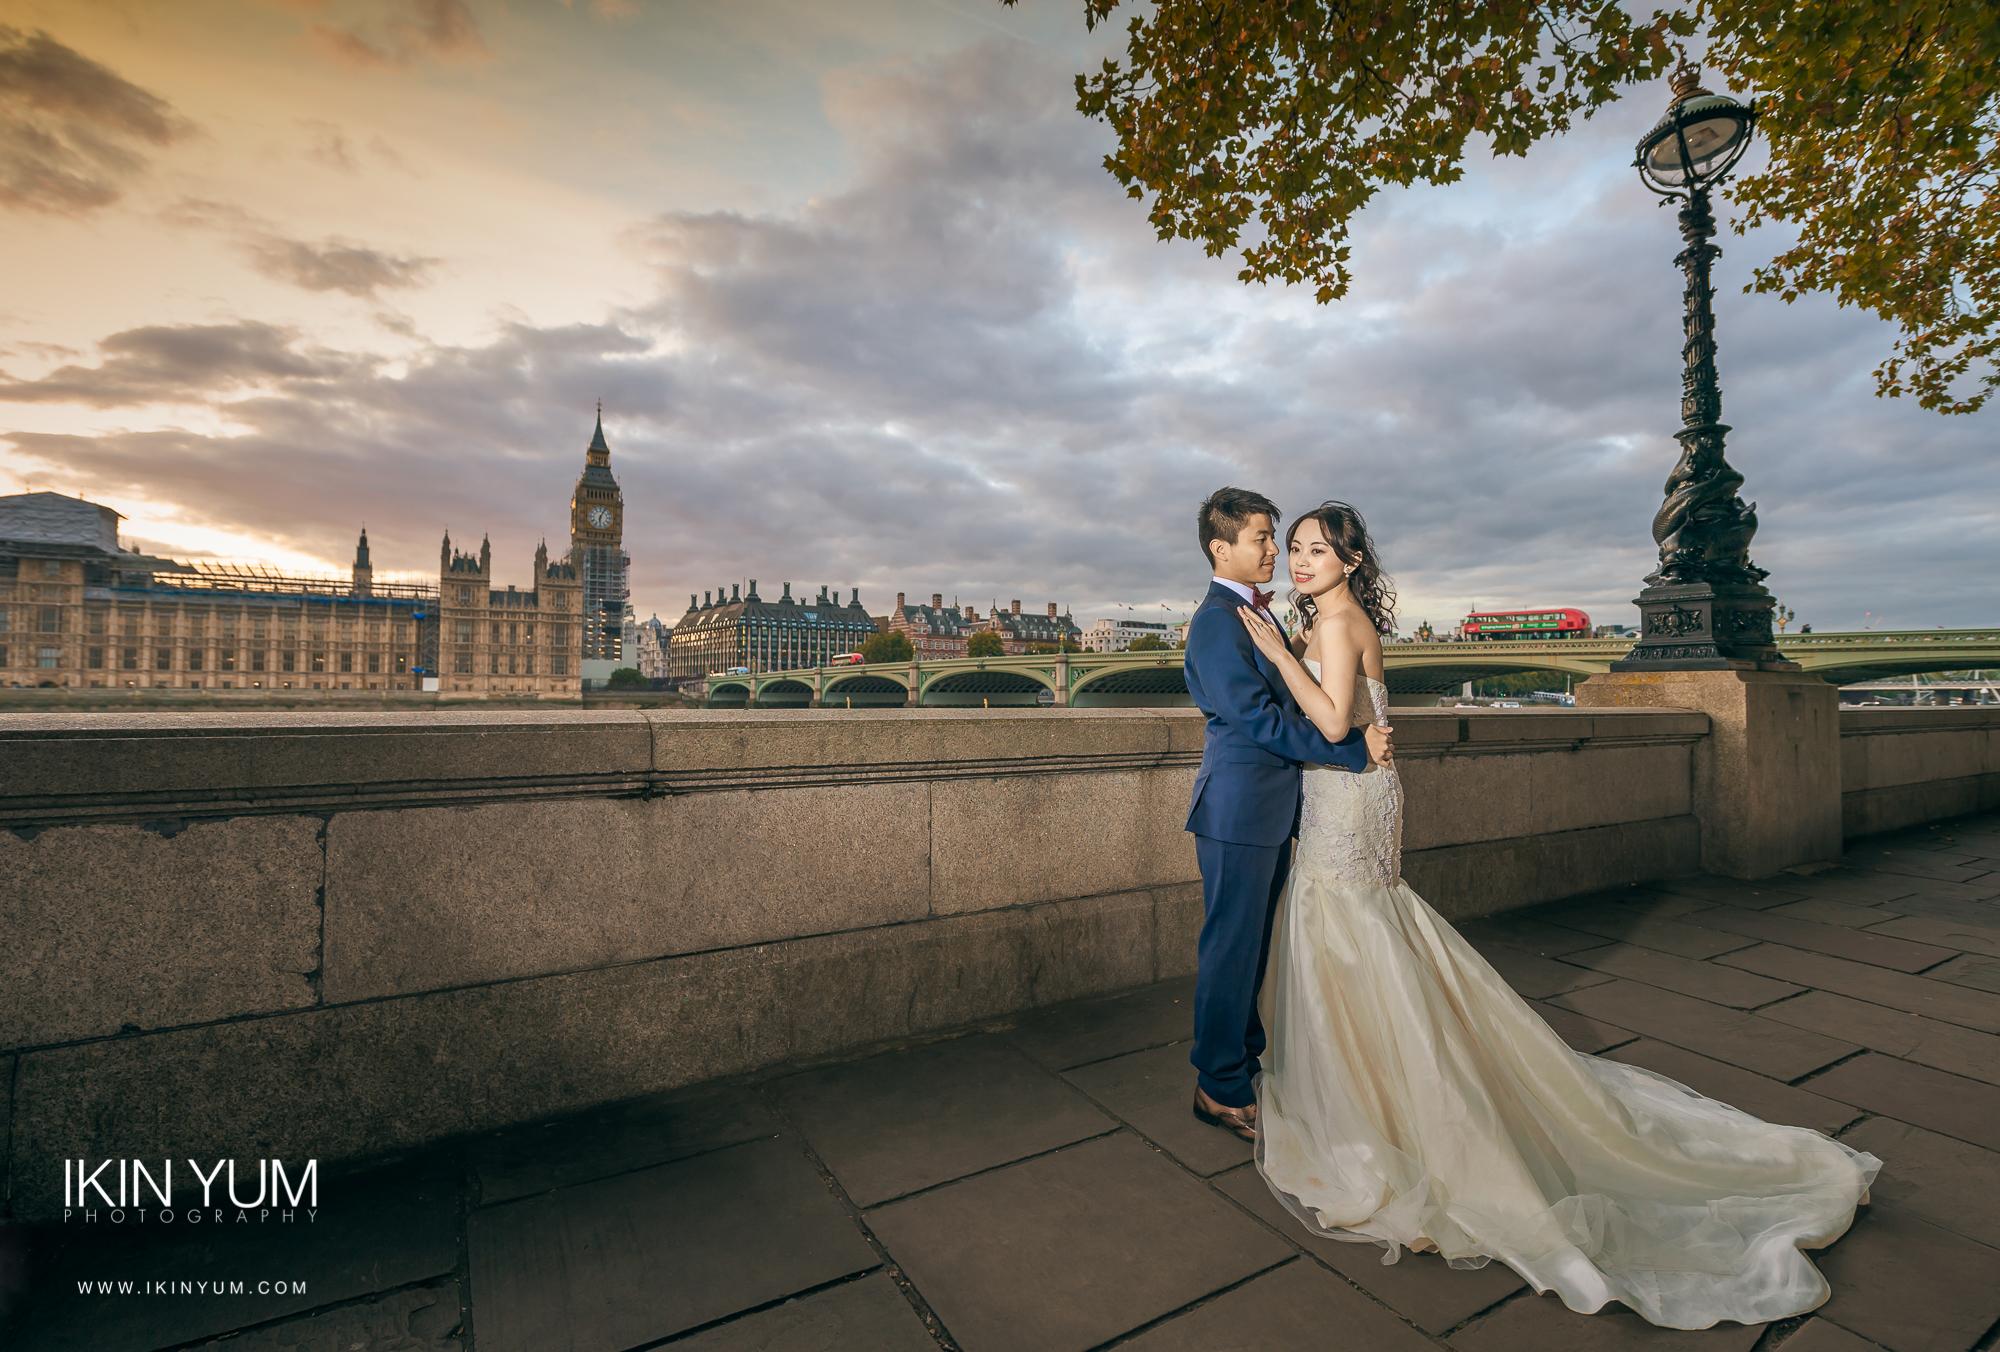 Chloe & Carlos Pre-Wedding Shoot- Ikin Yum Photography-0120.jpg